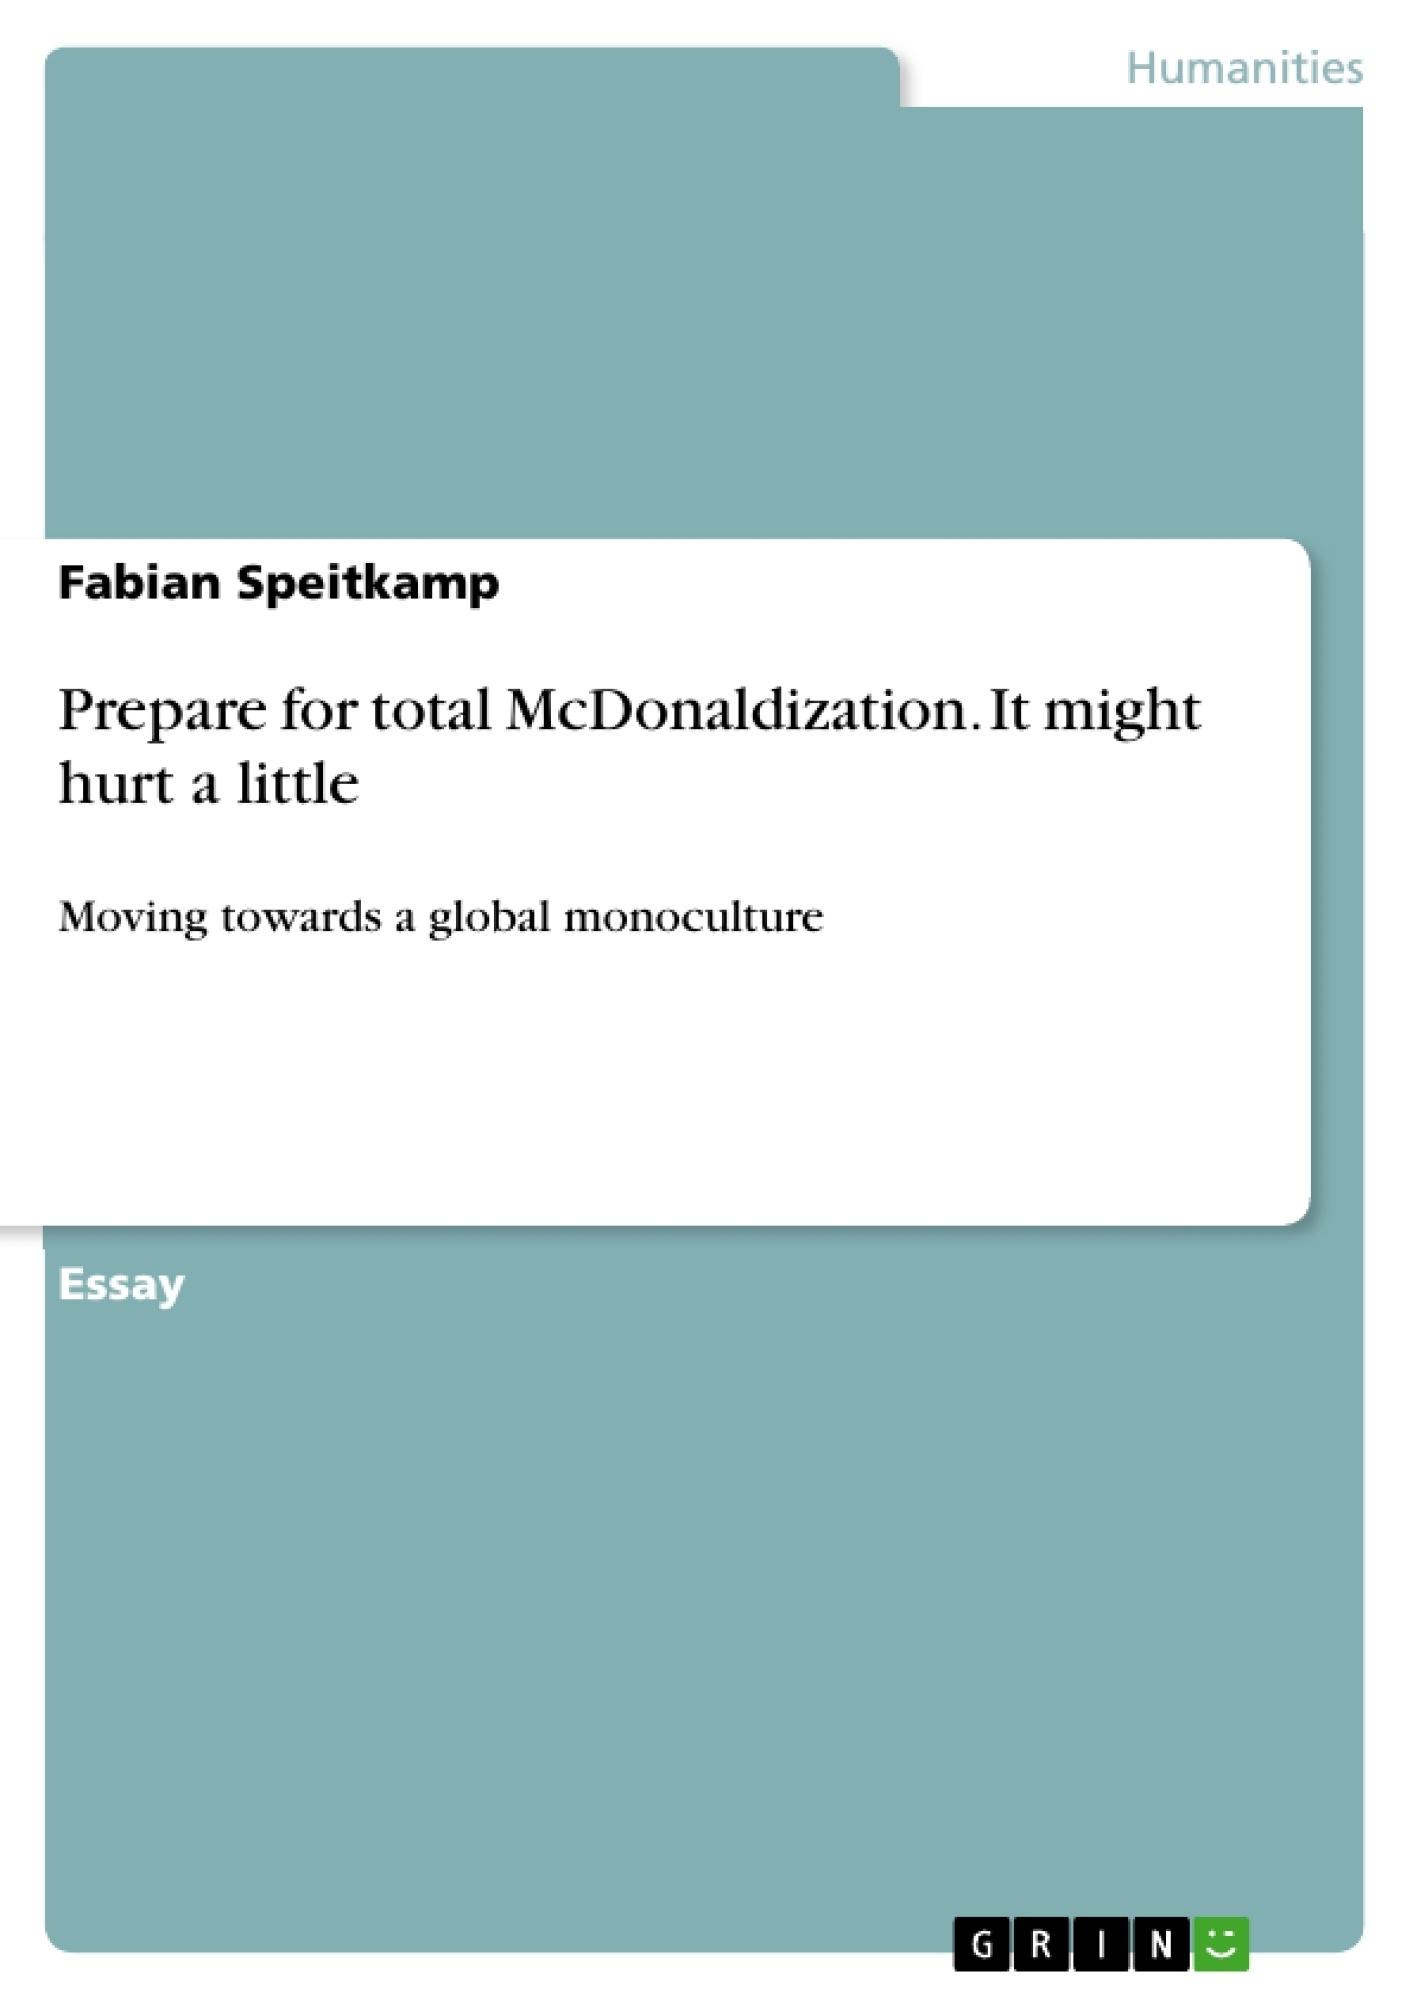 Title: Prepare for total McDonaldization. It might hurt a little